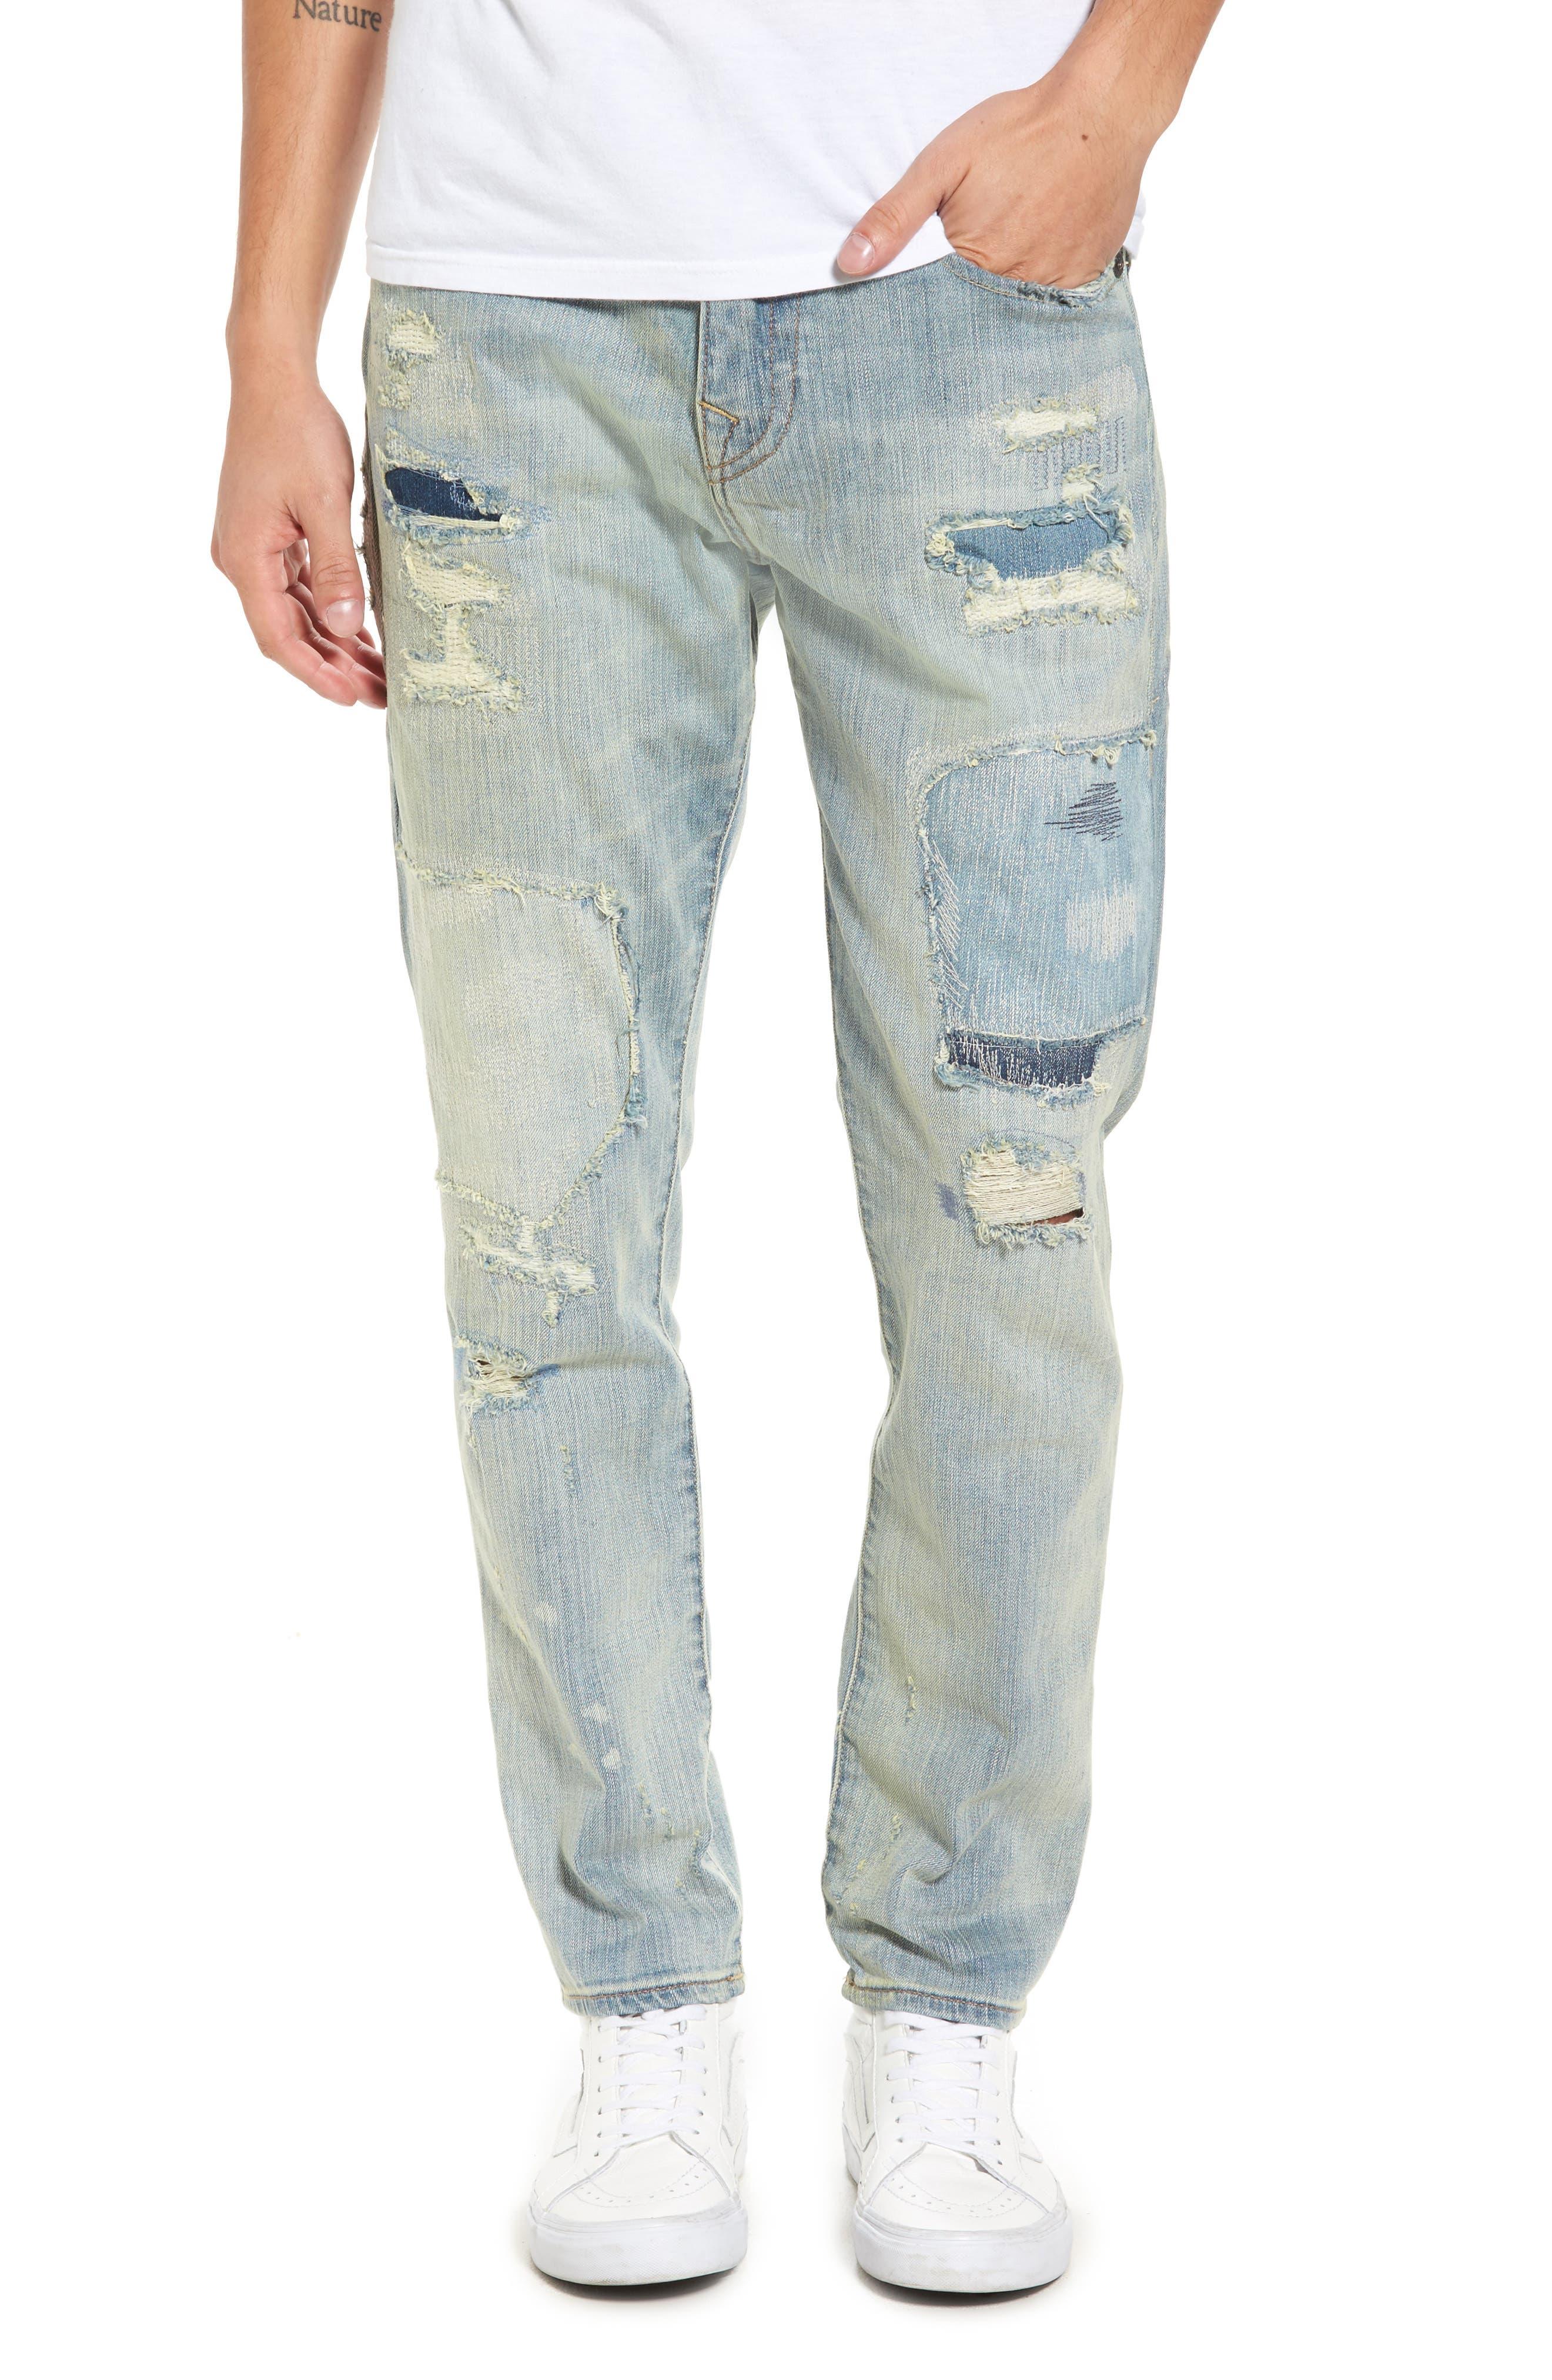 Main Image - True Religion Brand Jeans Mick Skinny Fit Jeans (Indigo Immortal)